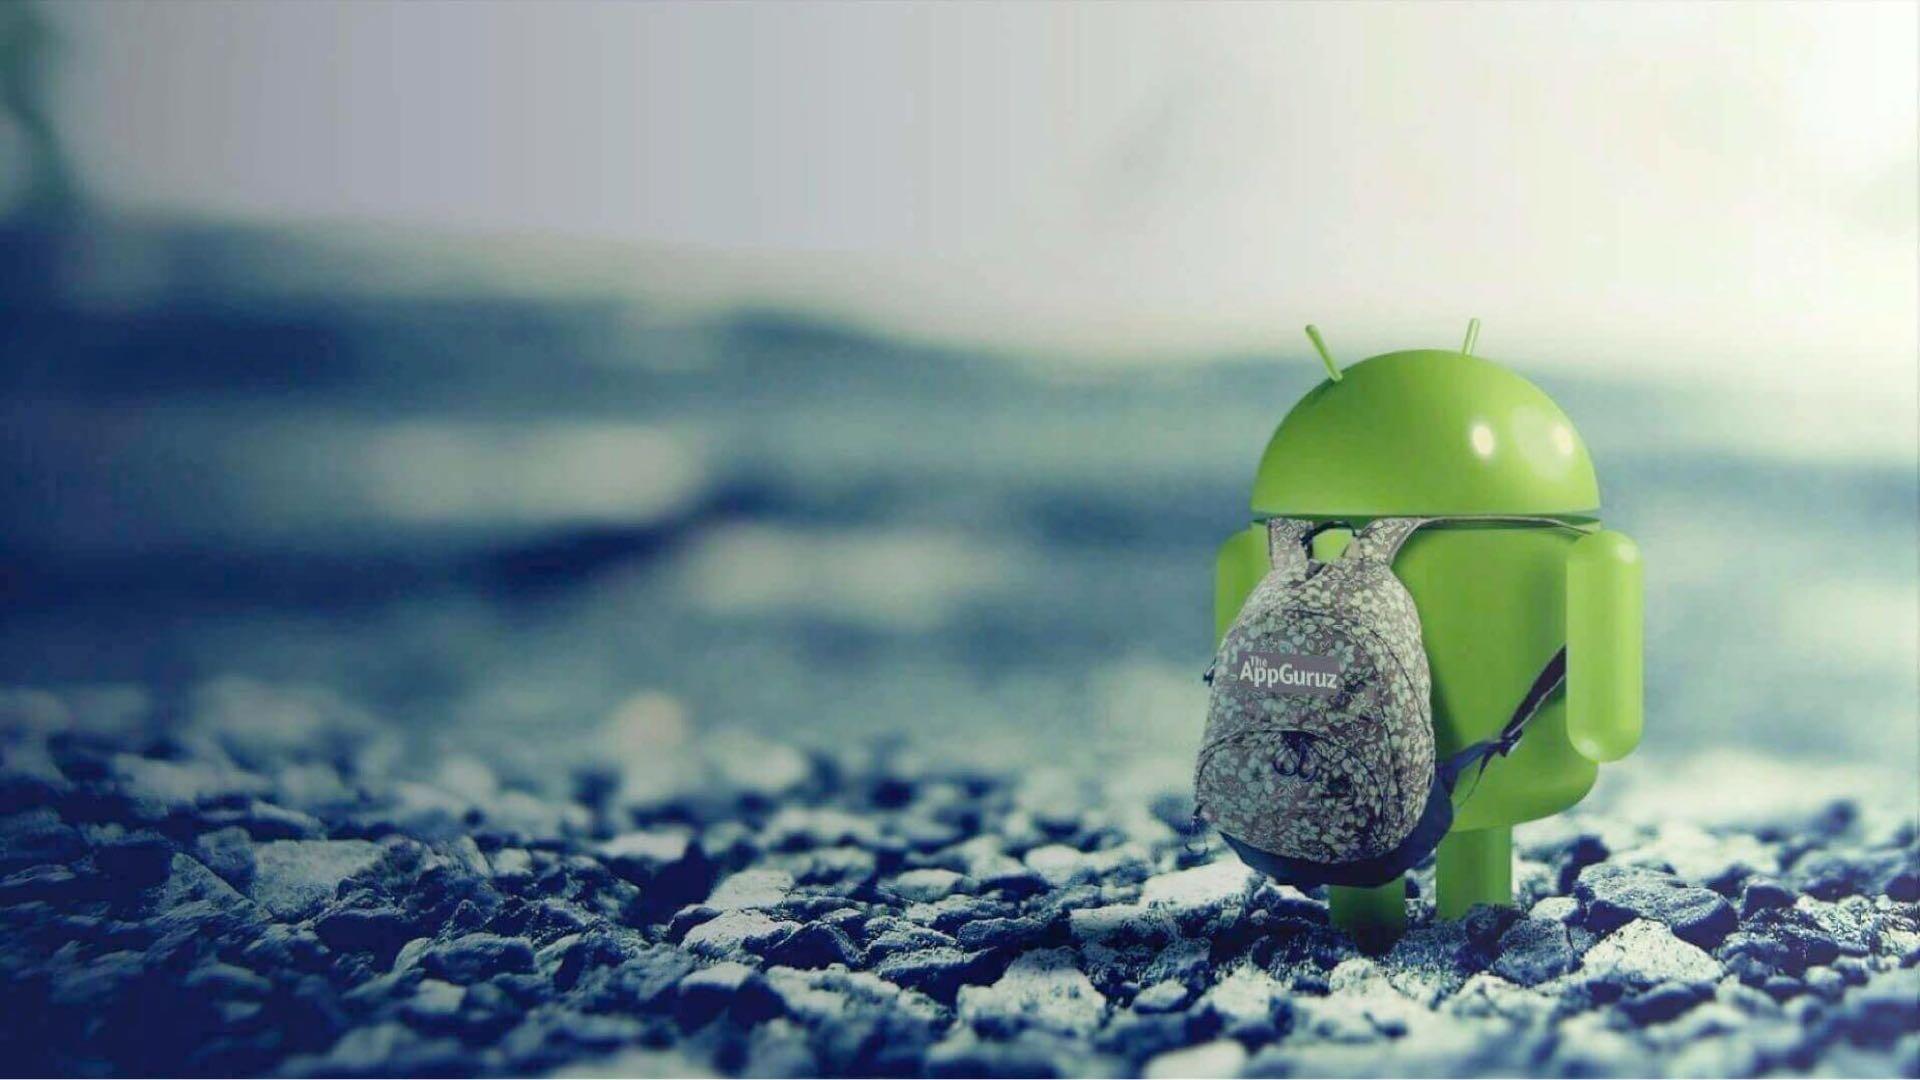 Android Application Development - TheAppGuruz